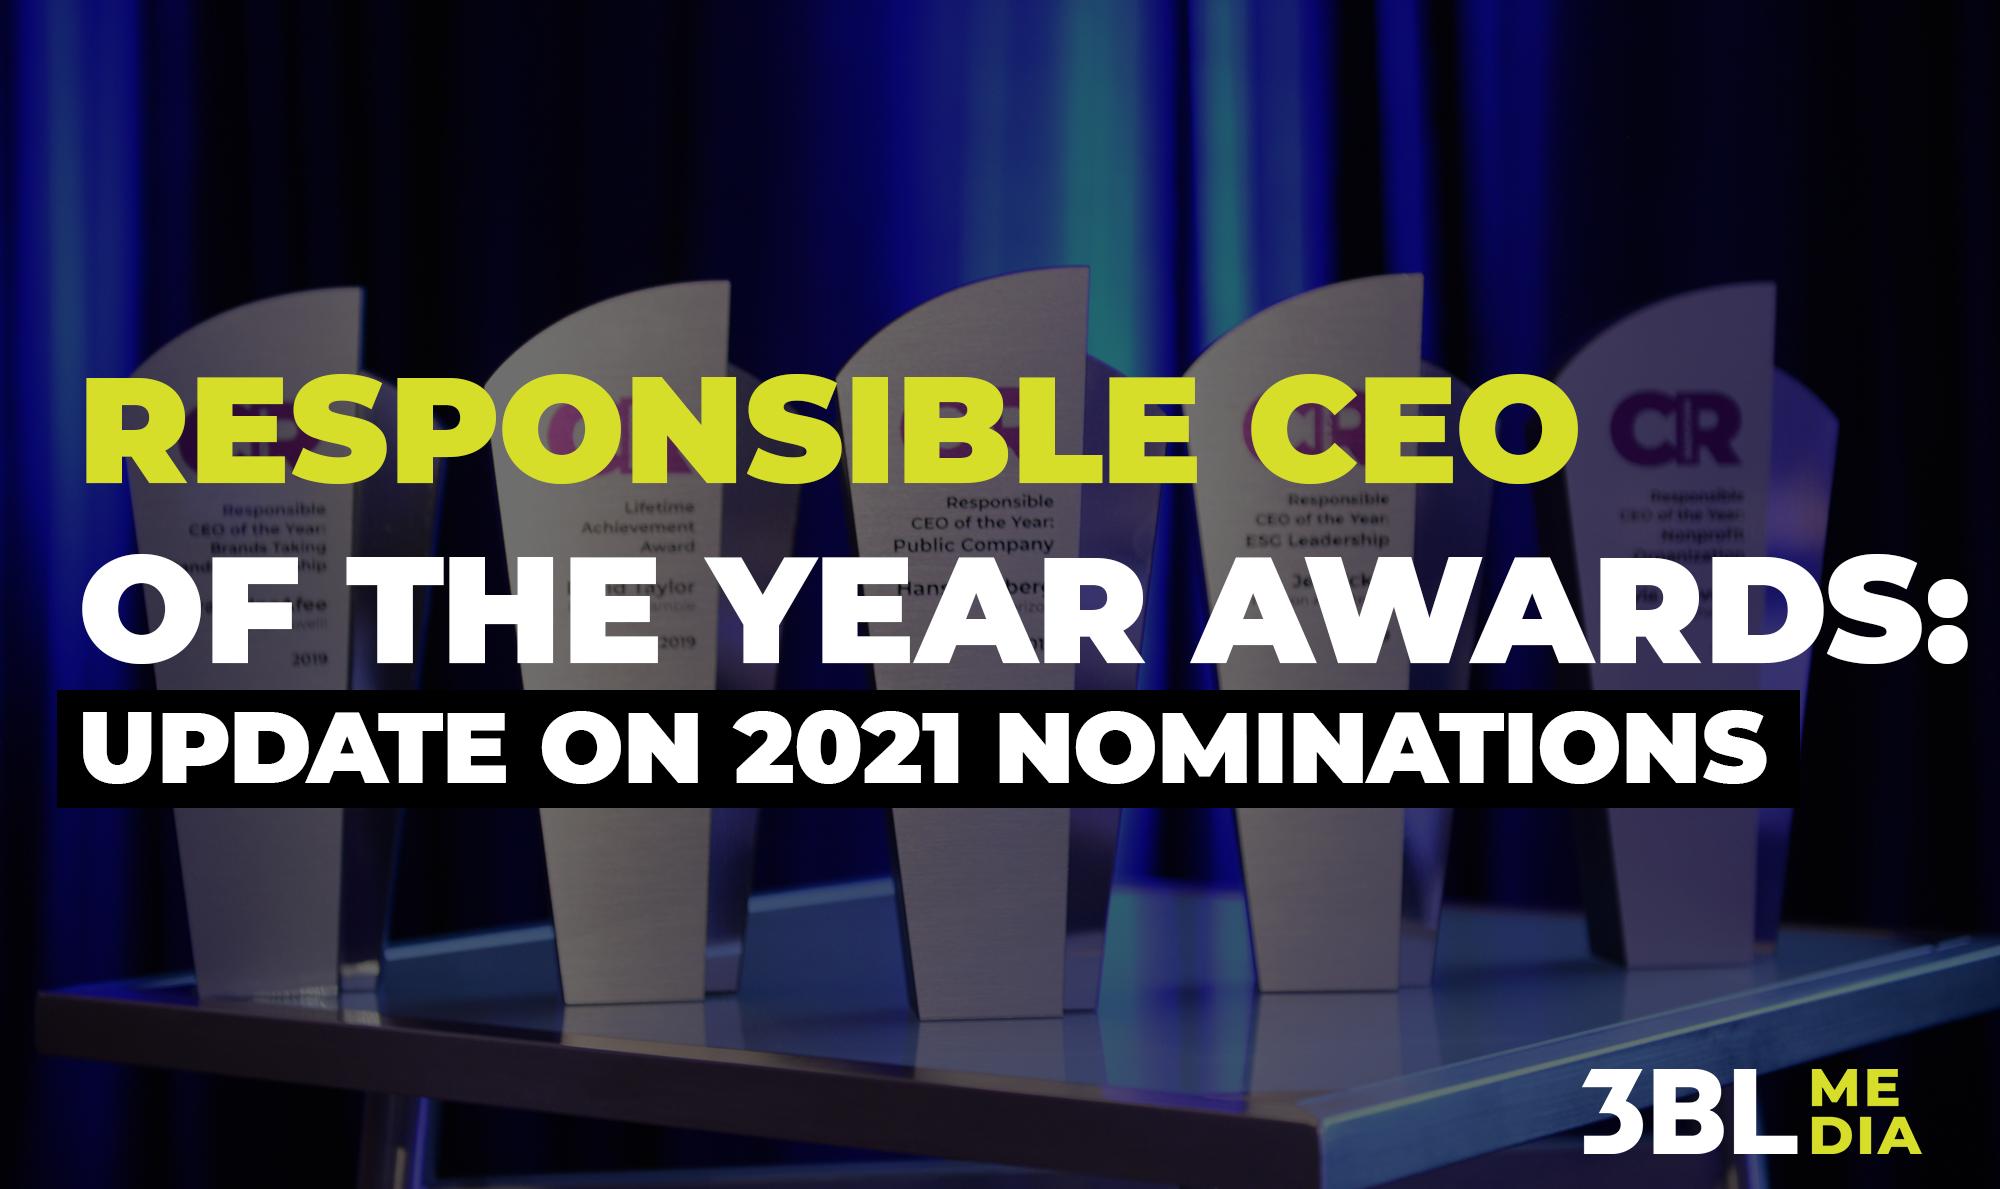 CEO awards 2021